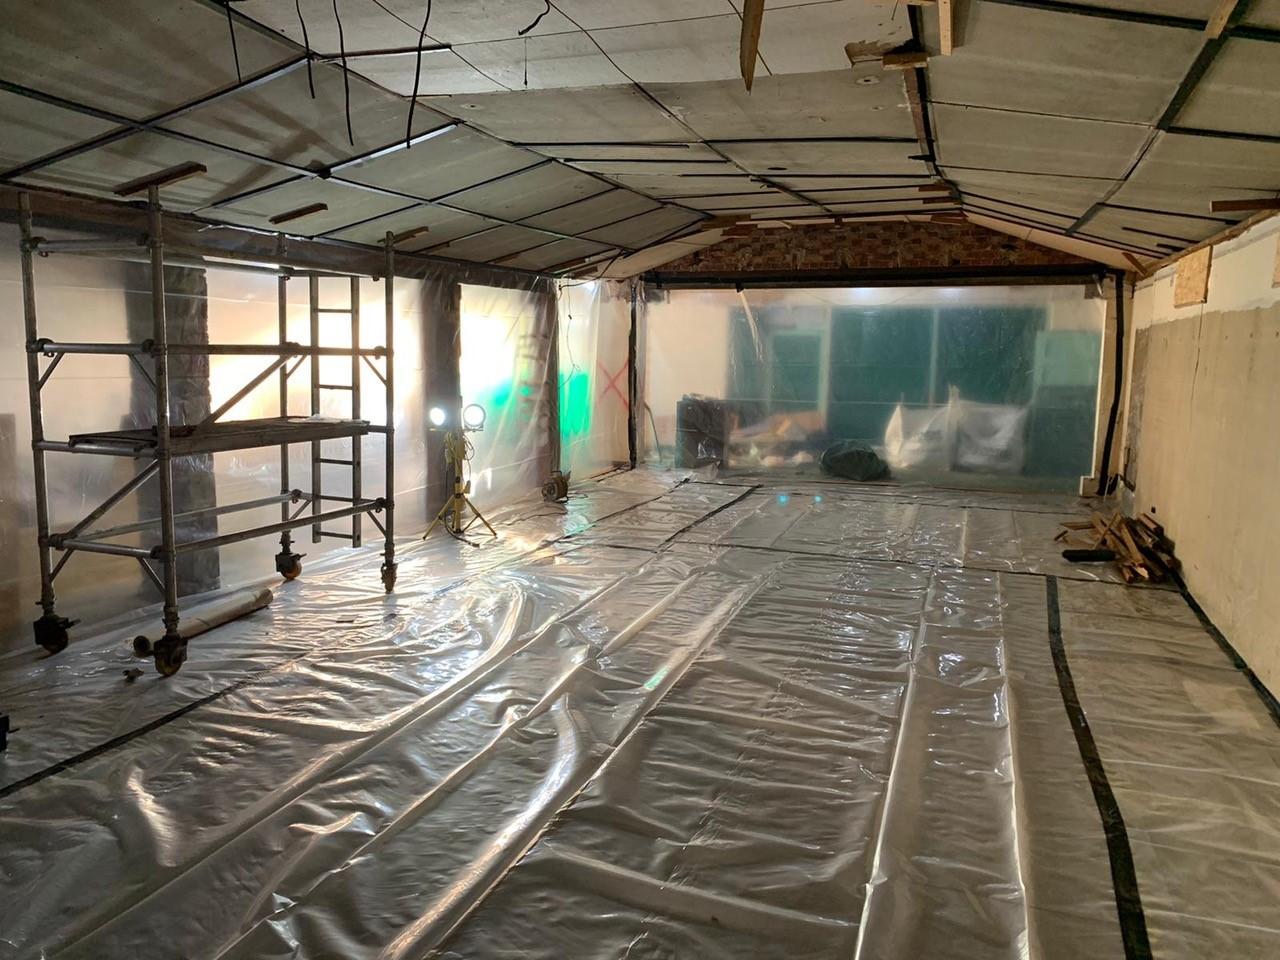 Asbestos removal, asbestos collection - Asbestos in older residential properties - Asbestos tiles in pre 1920's property